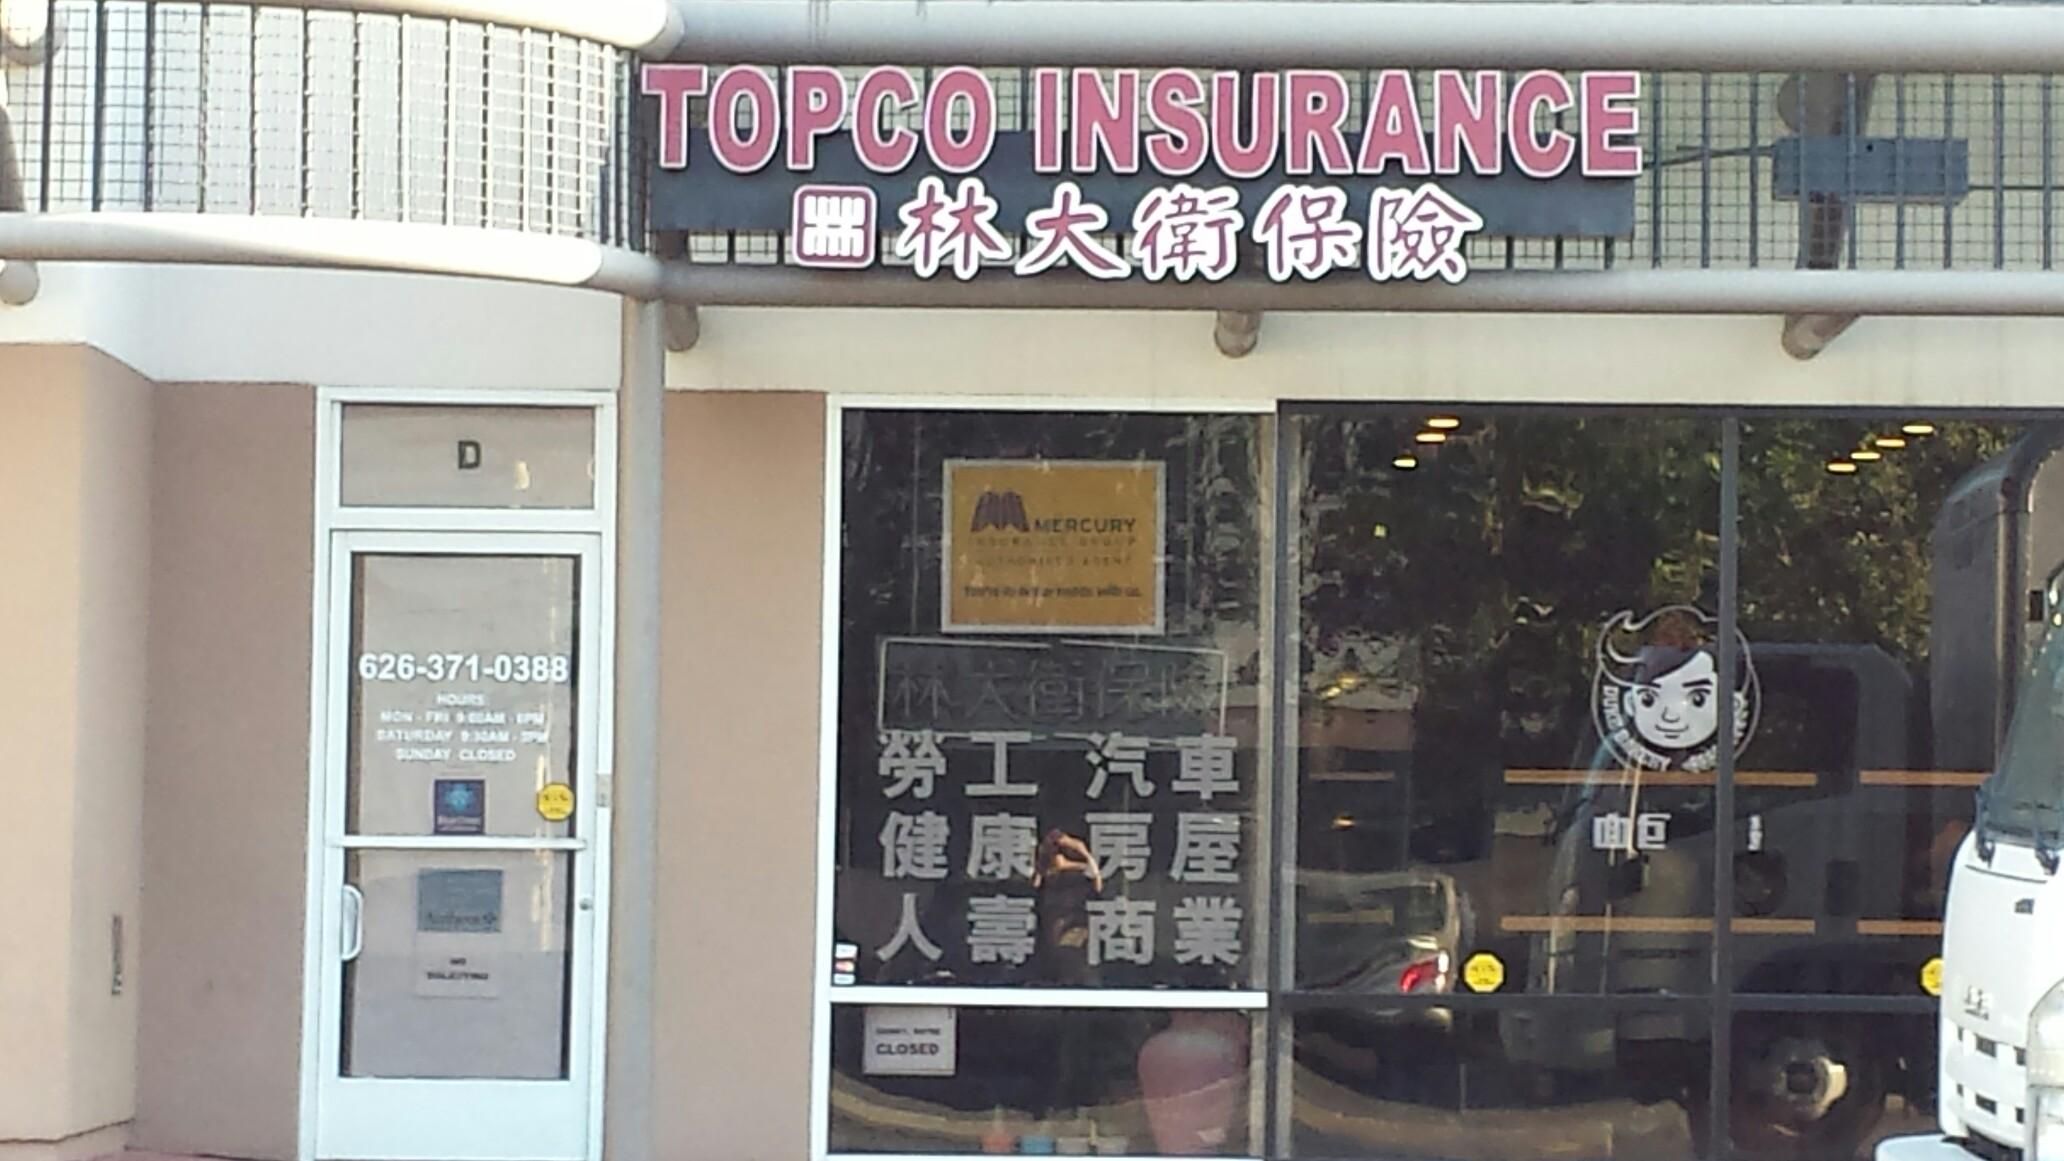 Topco Insurance Inc 713 W Duarte Rd Ste D Arcadia Ca